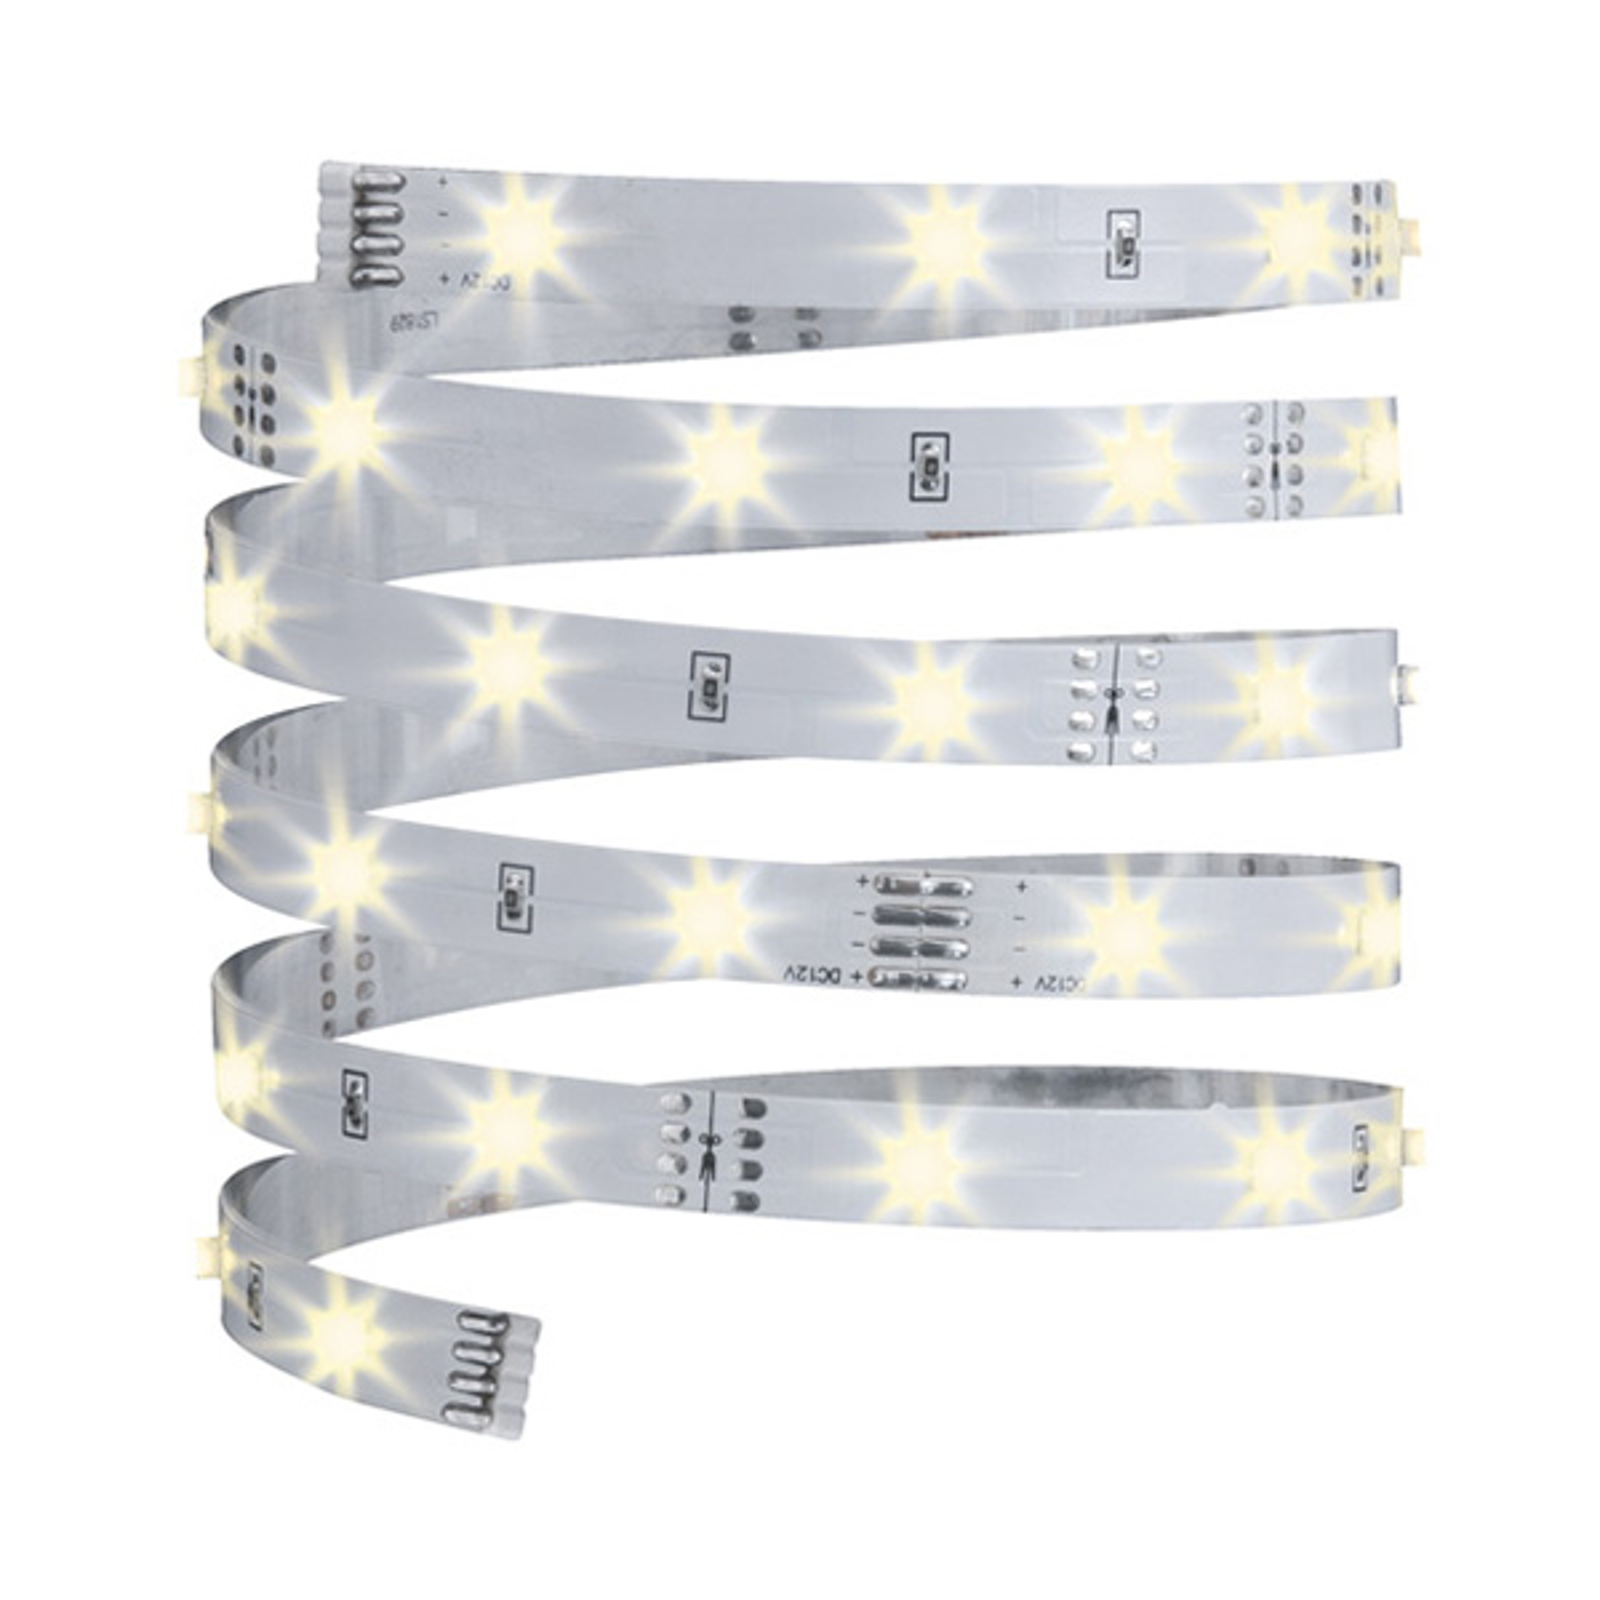 Strip LED da 3 m YourLED Eco, bianco, luce calda